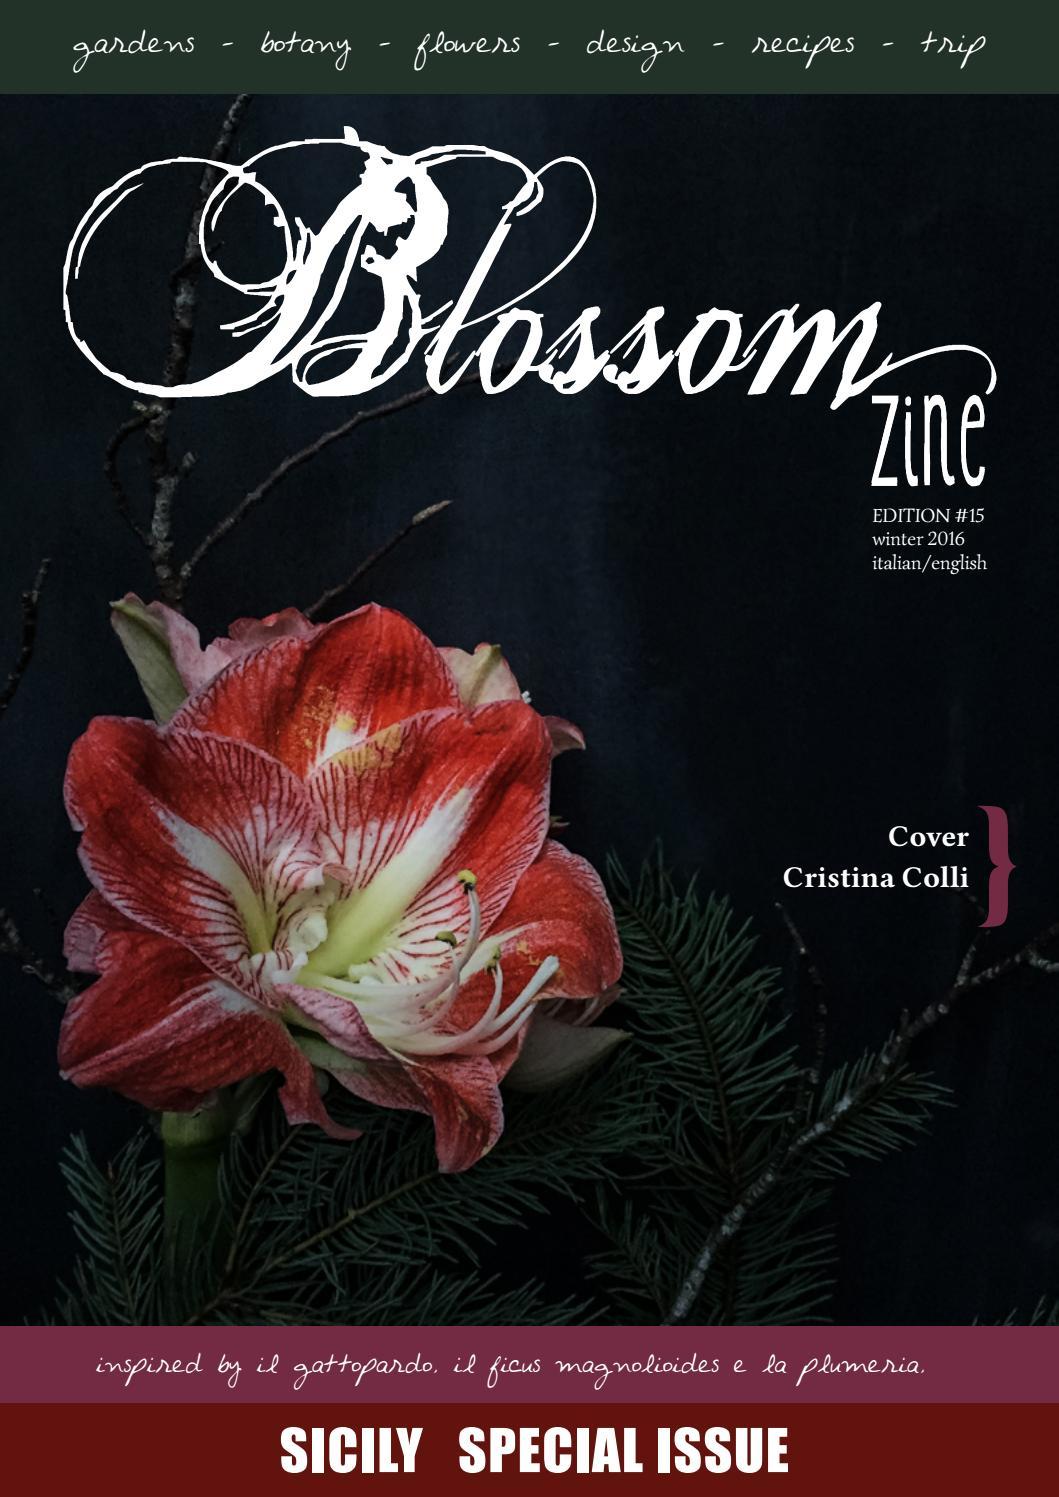 N 14 Autumn 2016 Blossom zine by Blossom zine - issuu